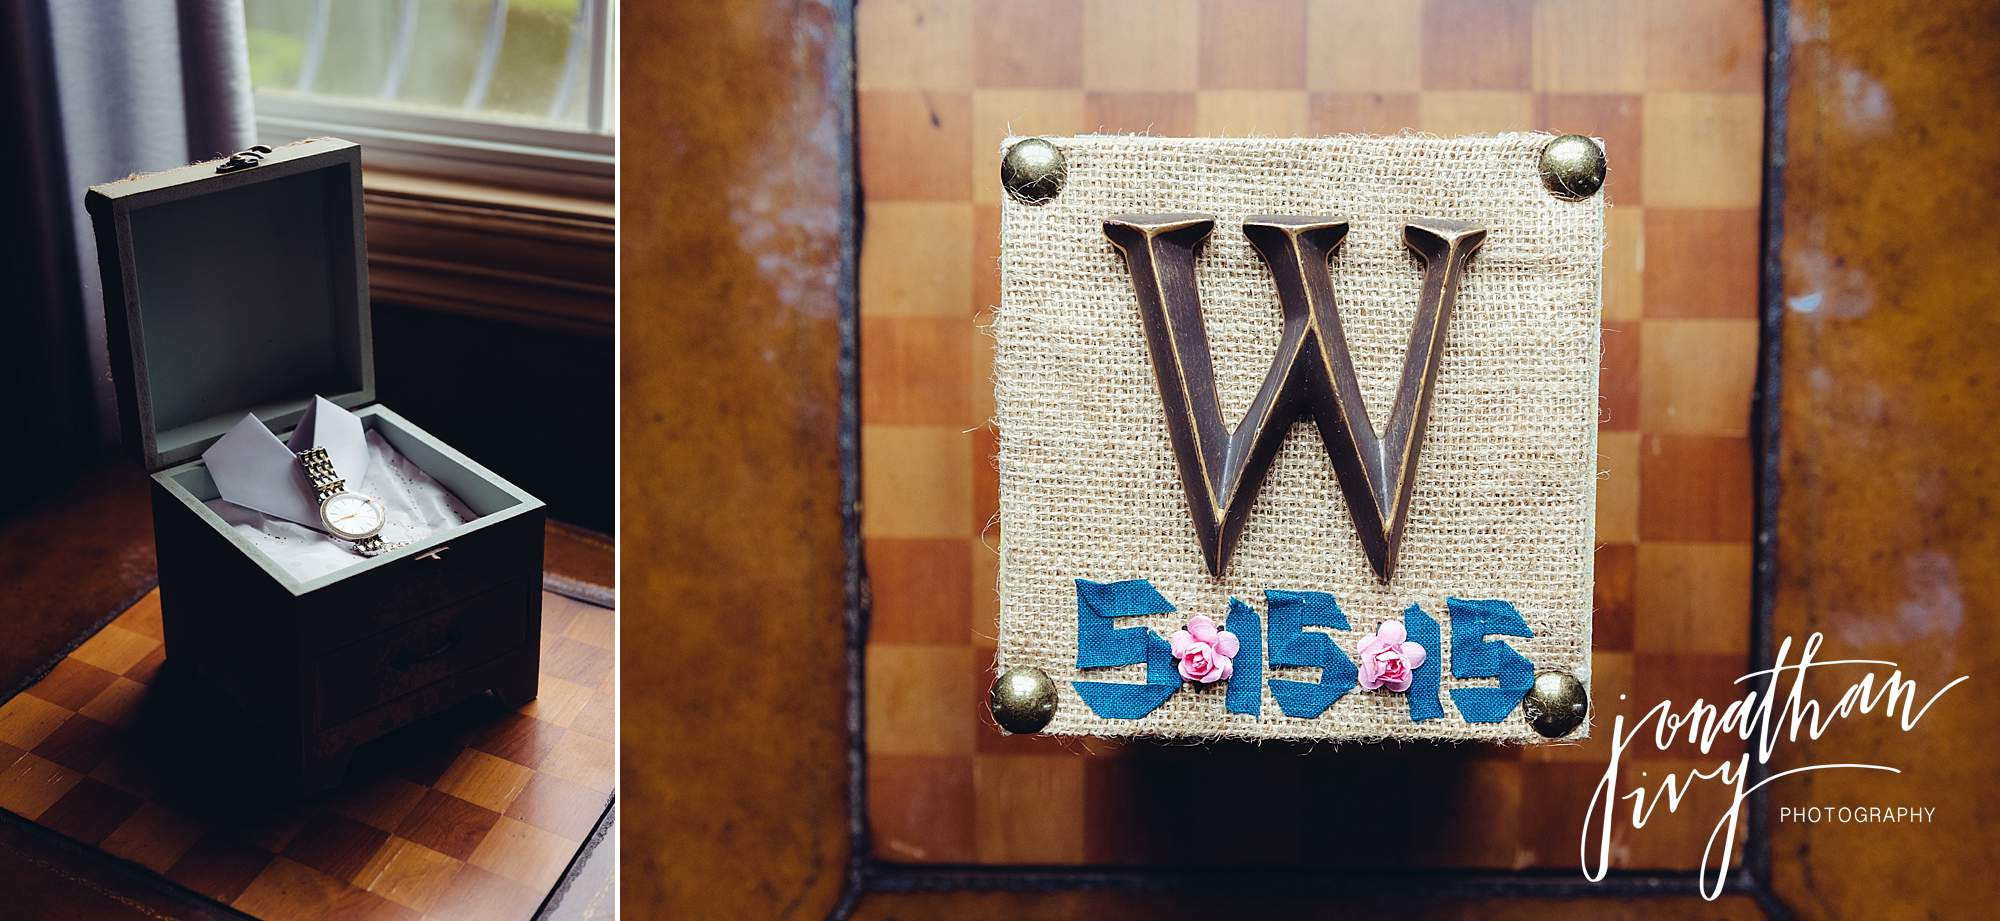 custom box brides gift from groom